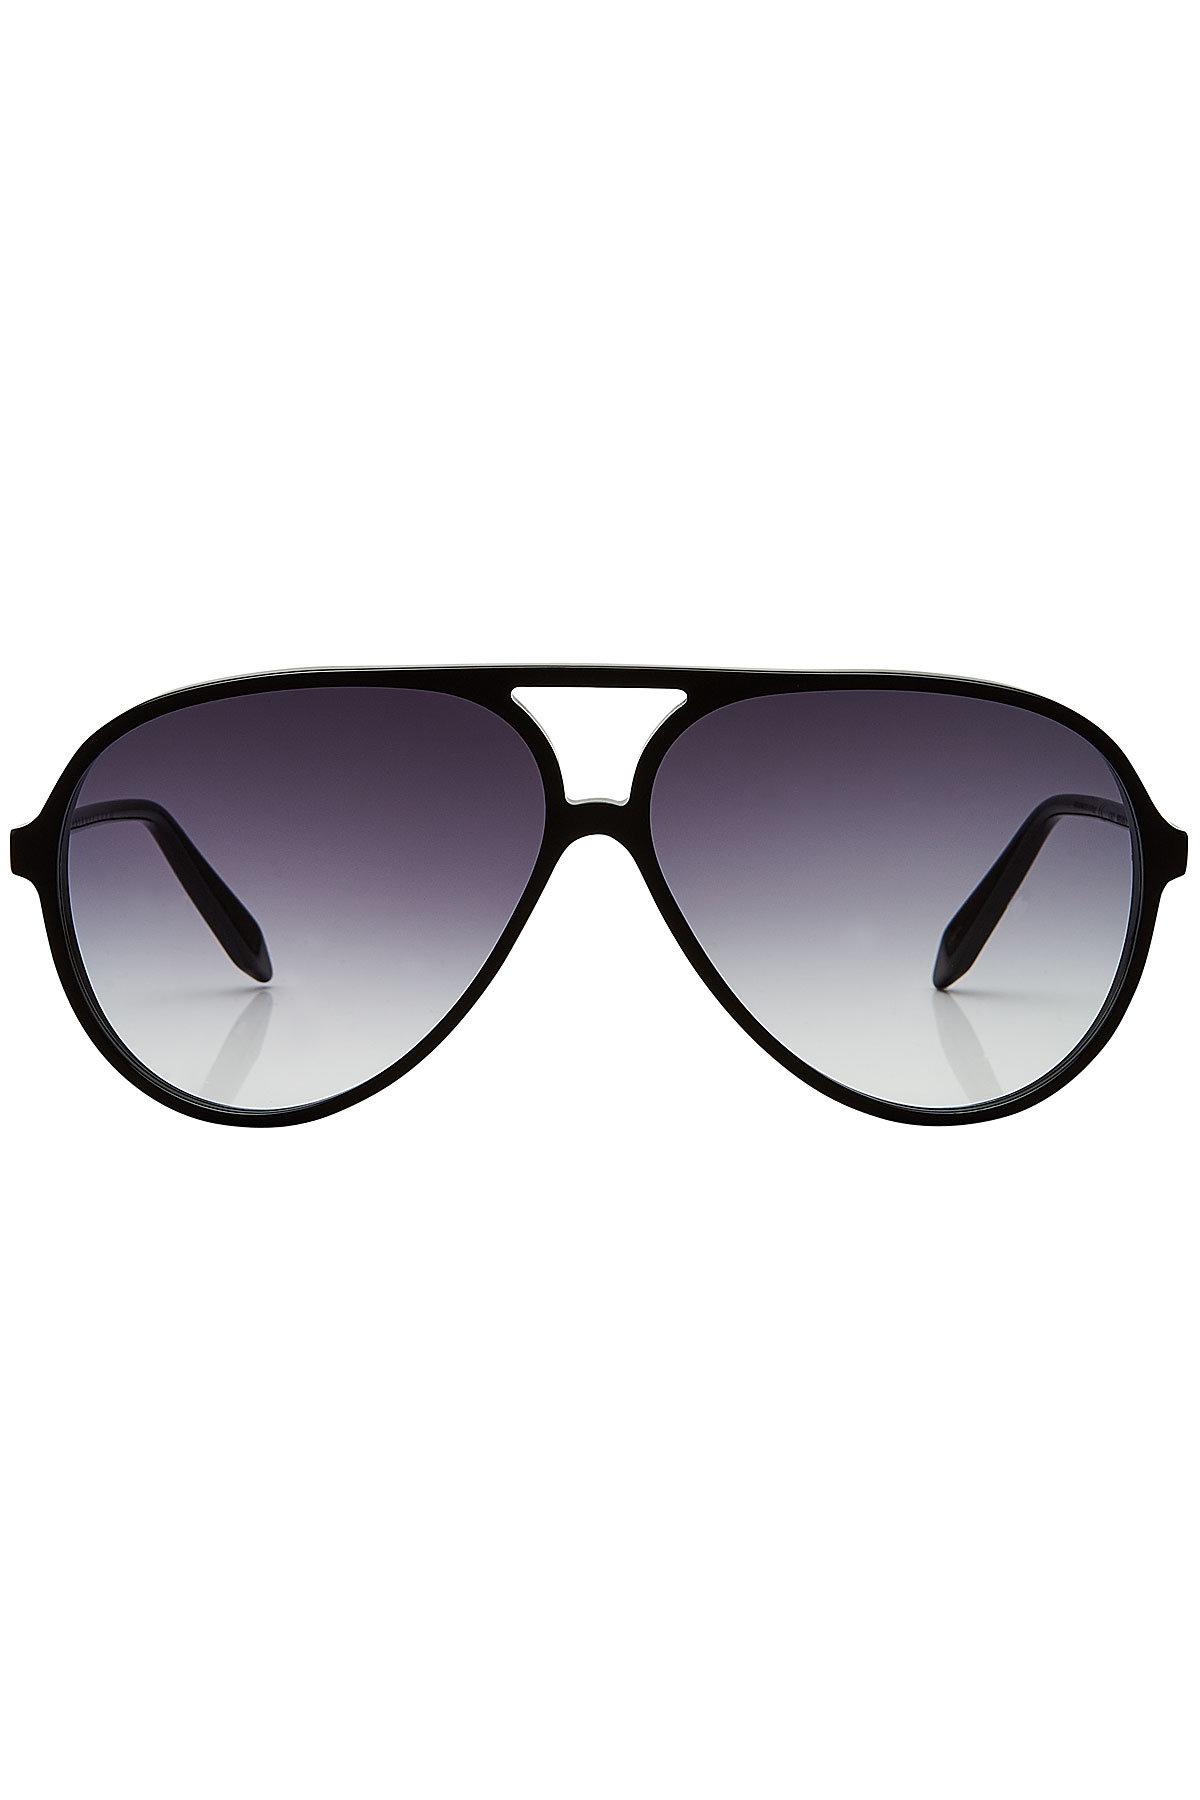 Fine Aviator Sunglasses | VICTORIA BECKHAM